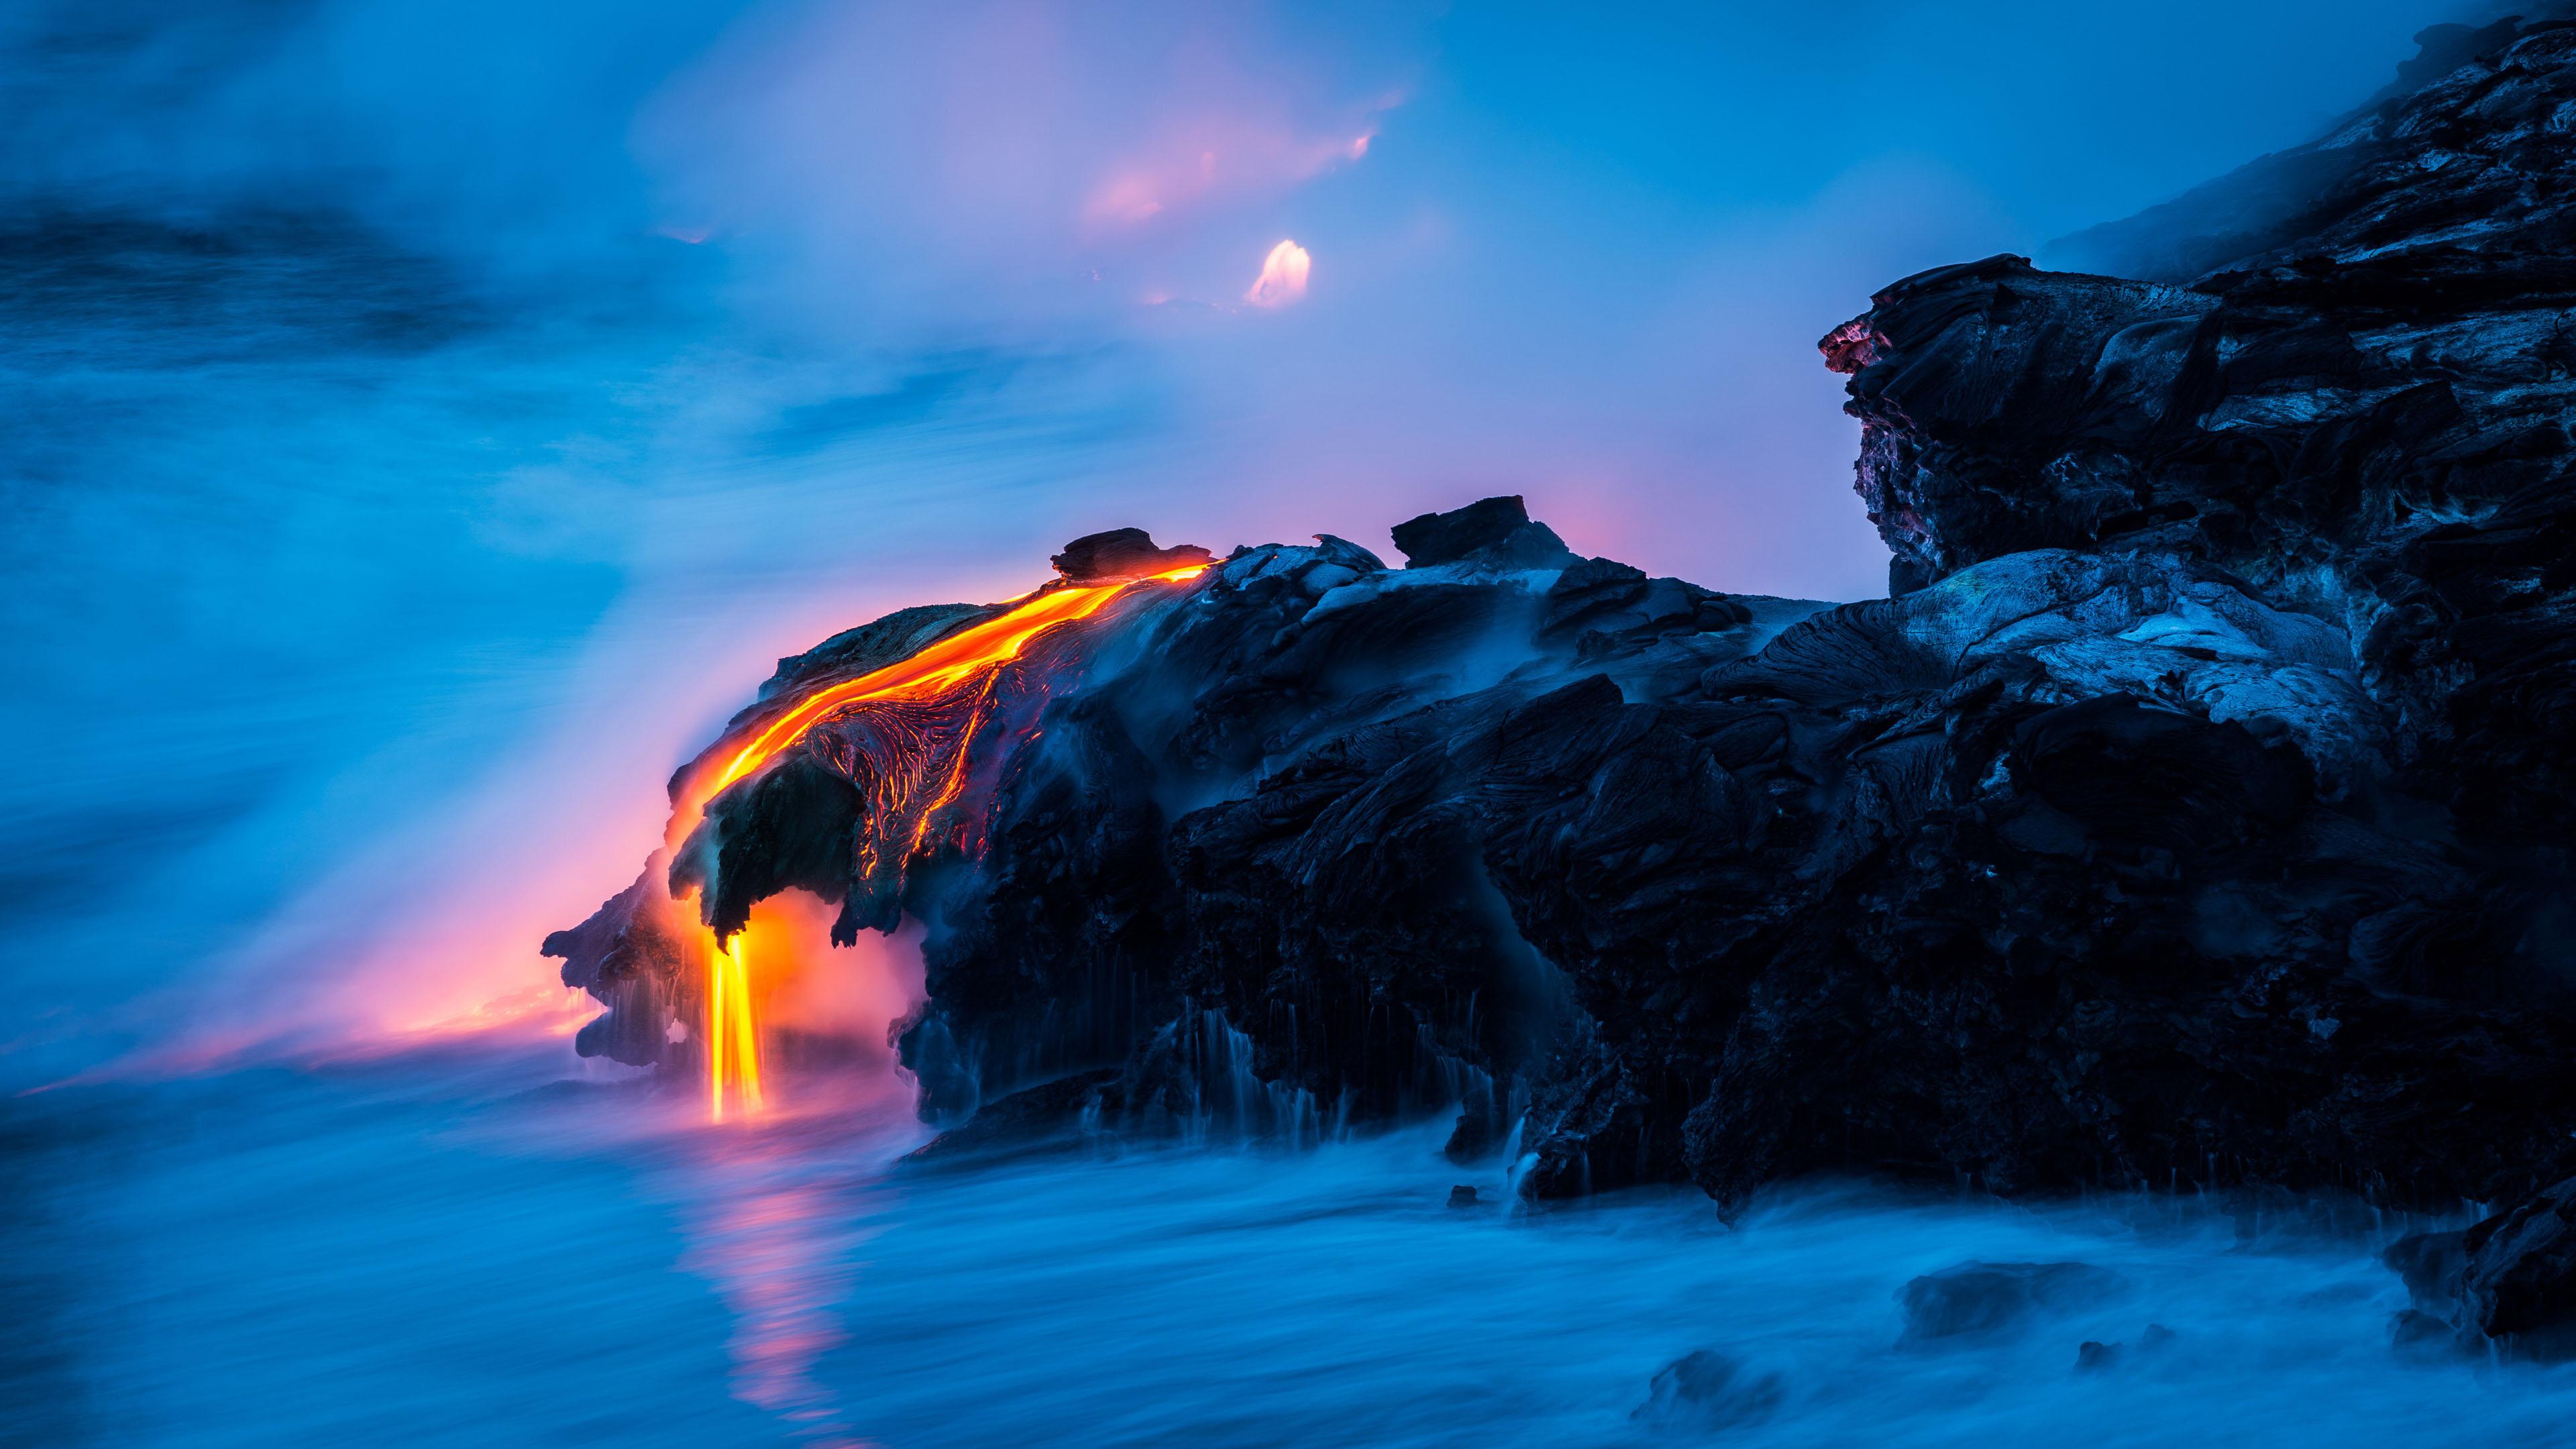 4K专区,奇幻梦境,自然之美,火山,熔岩,win10